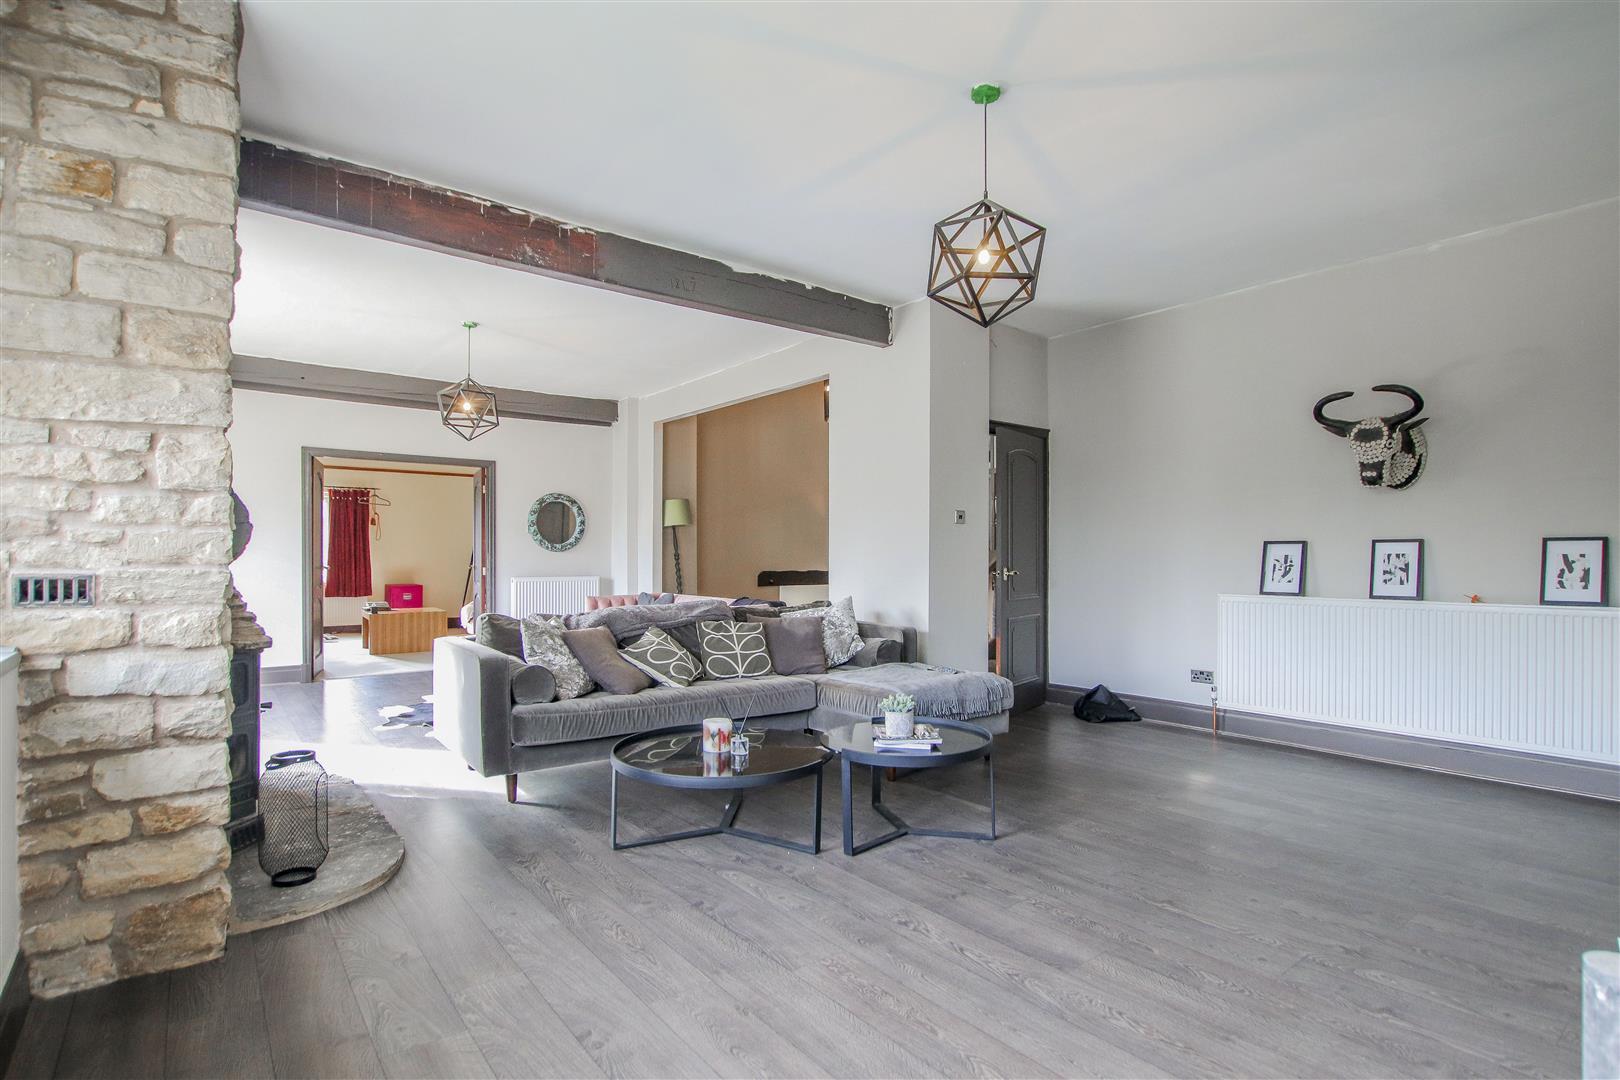 6 Bedroom Barn Conversion For Sale - 2.JPG